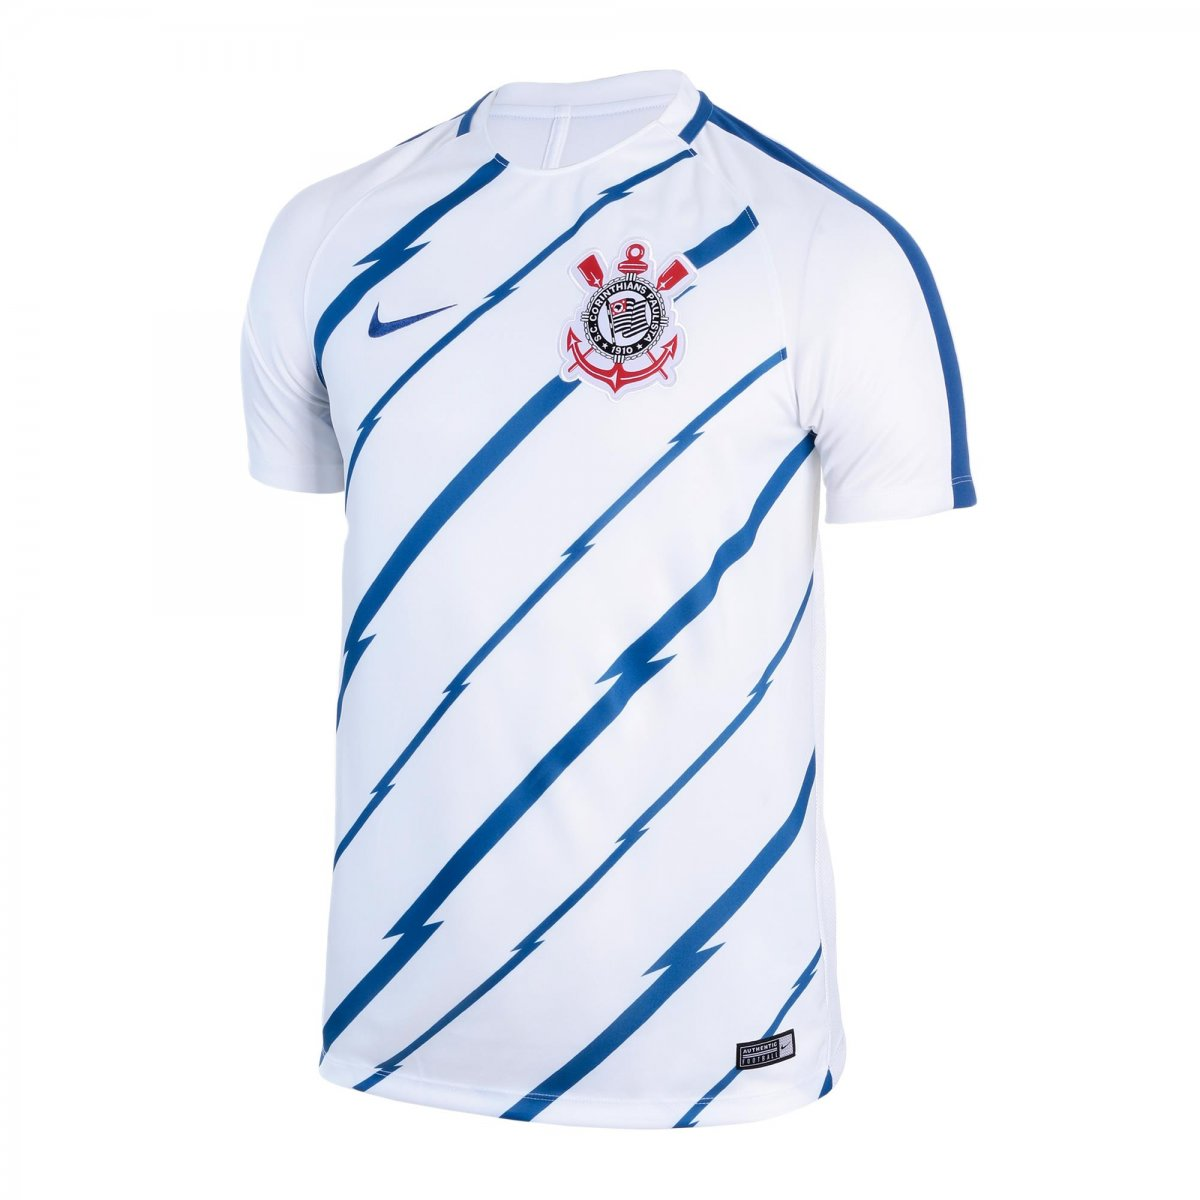 Camiseta Nike Corinthians Dry Squad Top Masculina 832285-100 Branco 362d2edb3c1dc